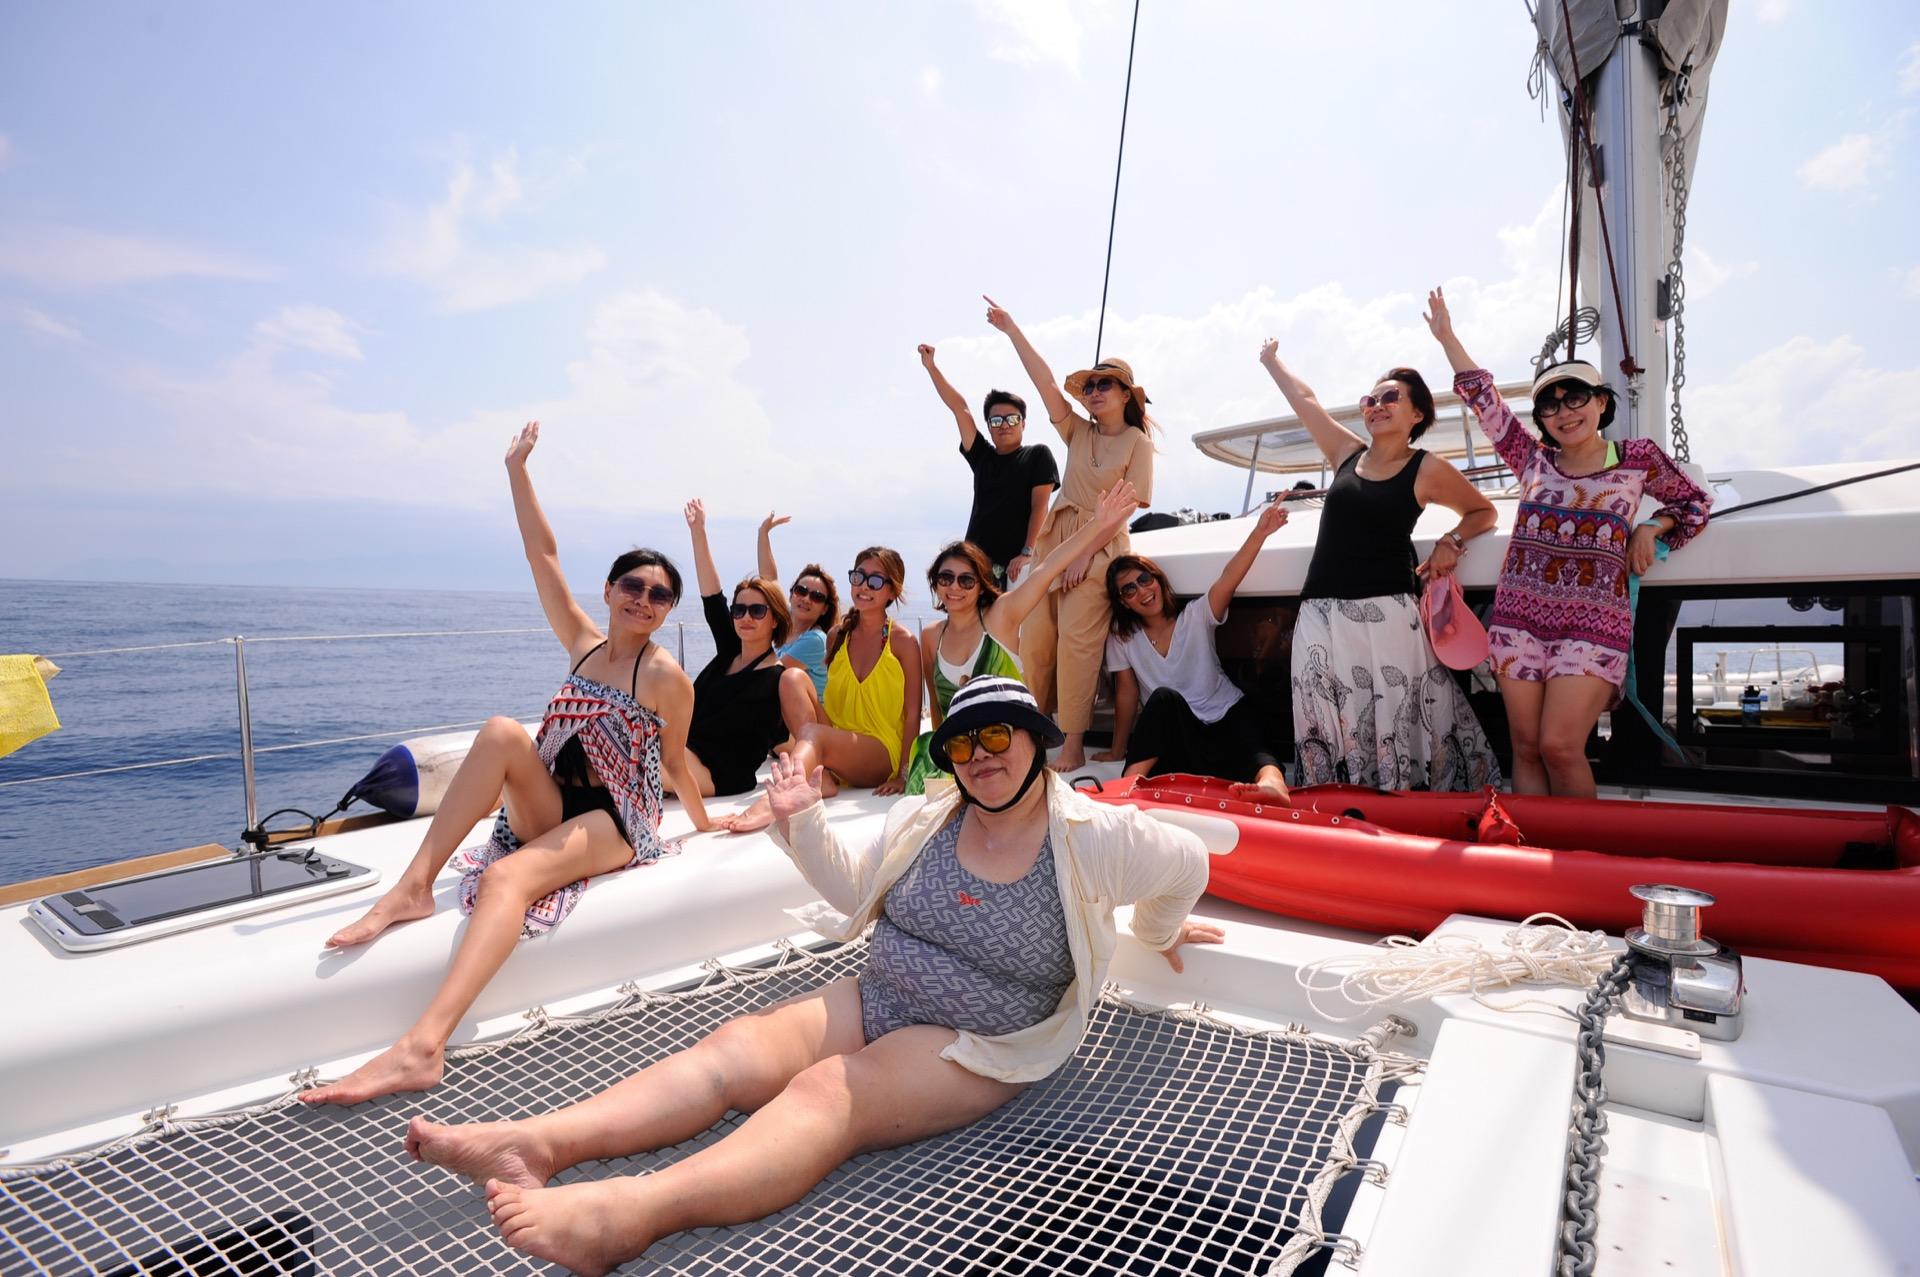 德築-DEZU-project-Fun3sport-lagoon-sailboat-ocean-3